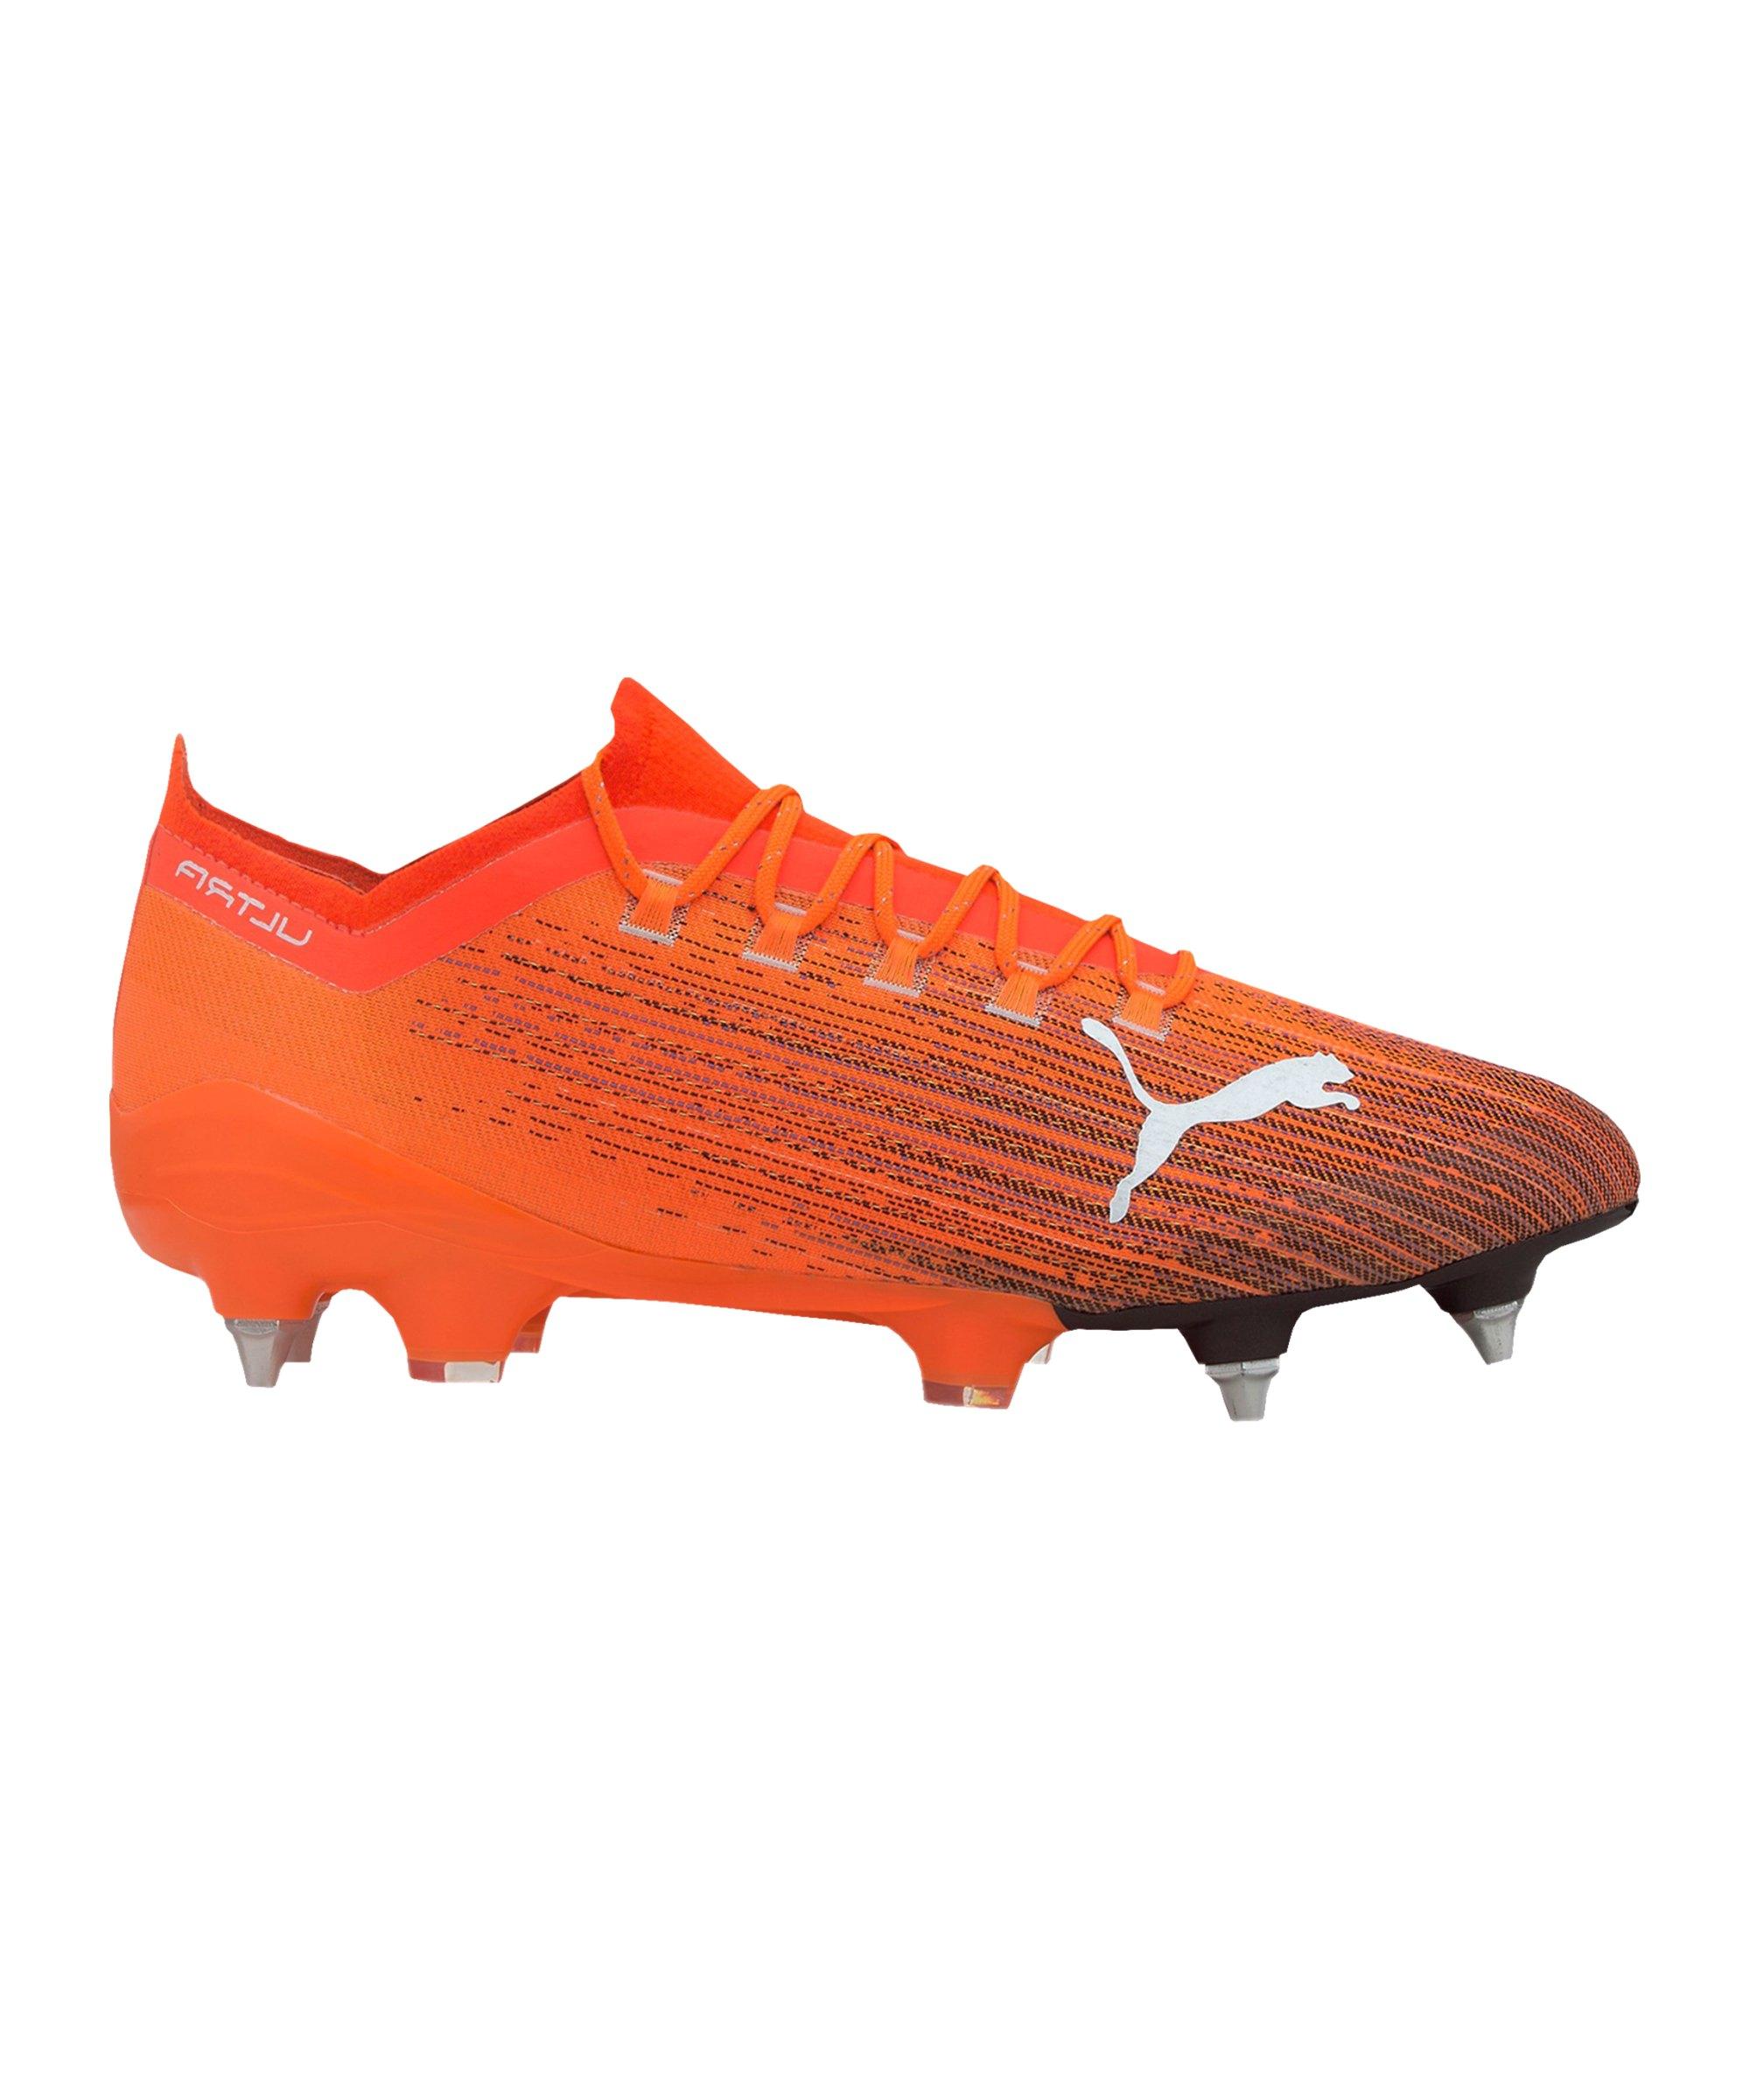 PUMA ULTRA Chasing Adrenaline 1.1 MxSG Orange F01 - orange